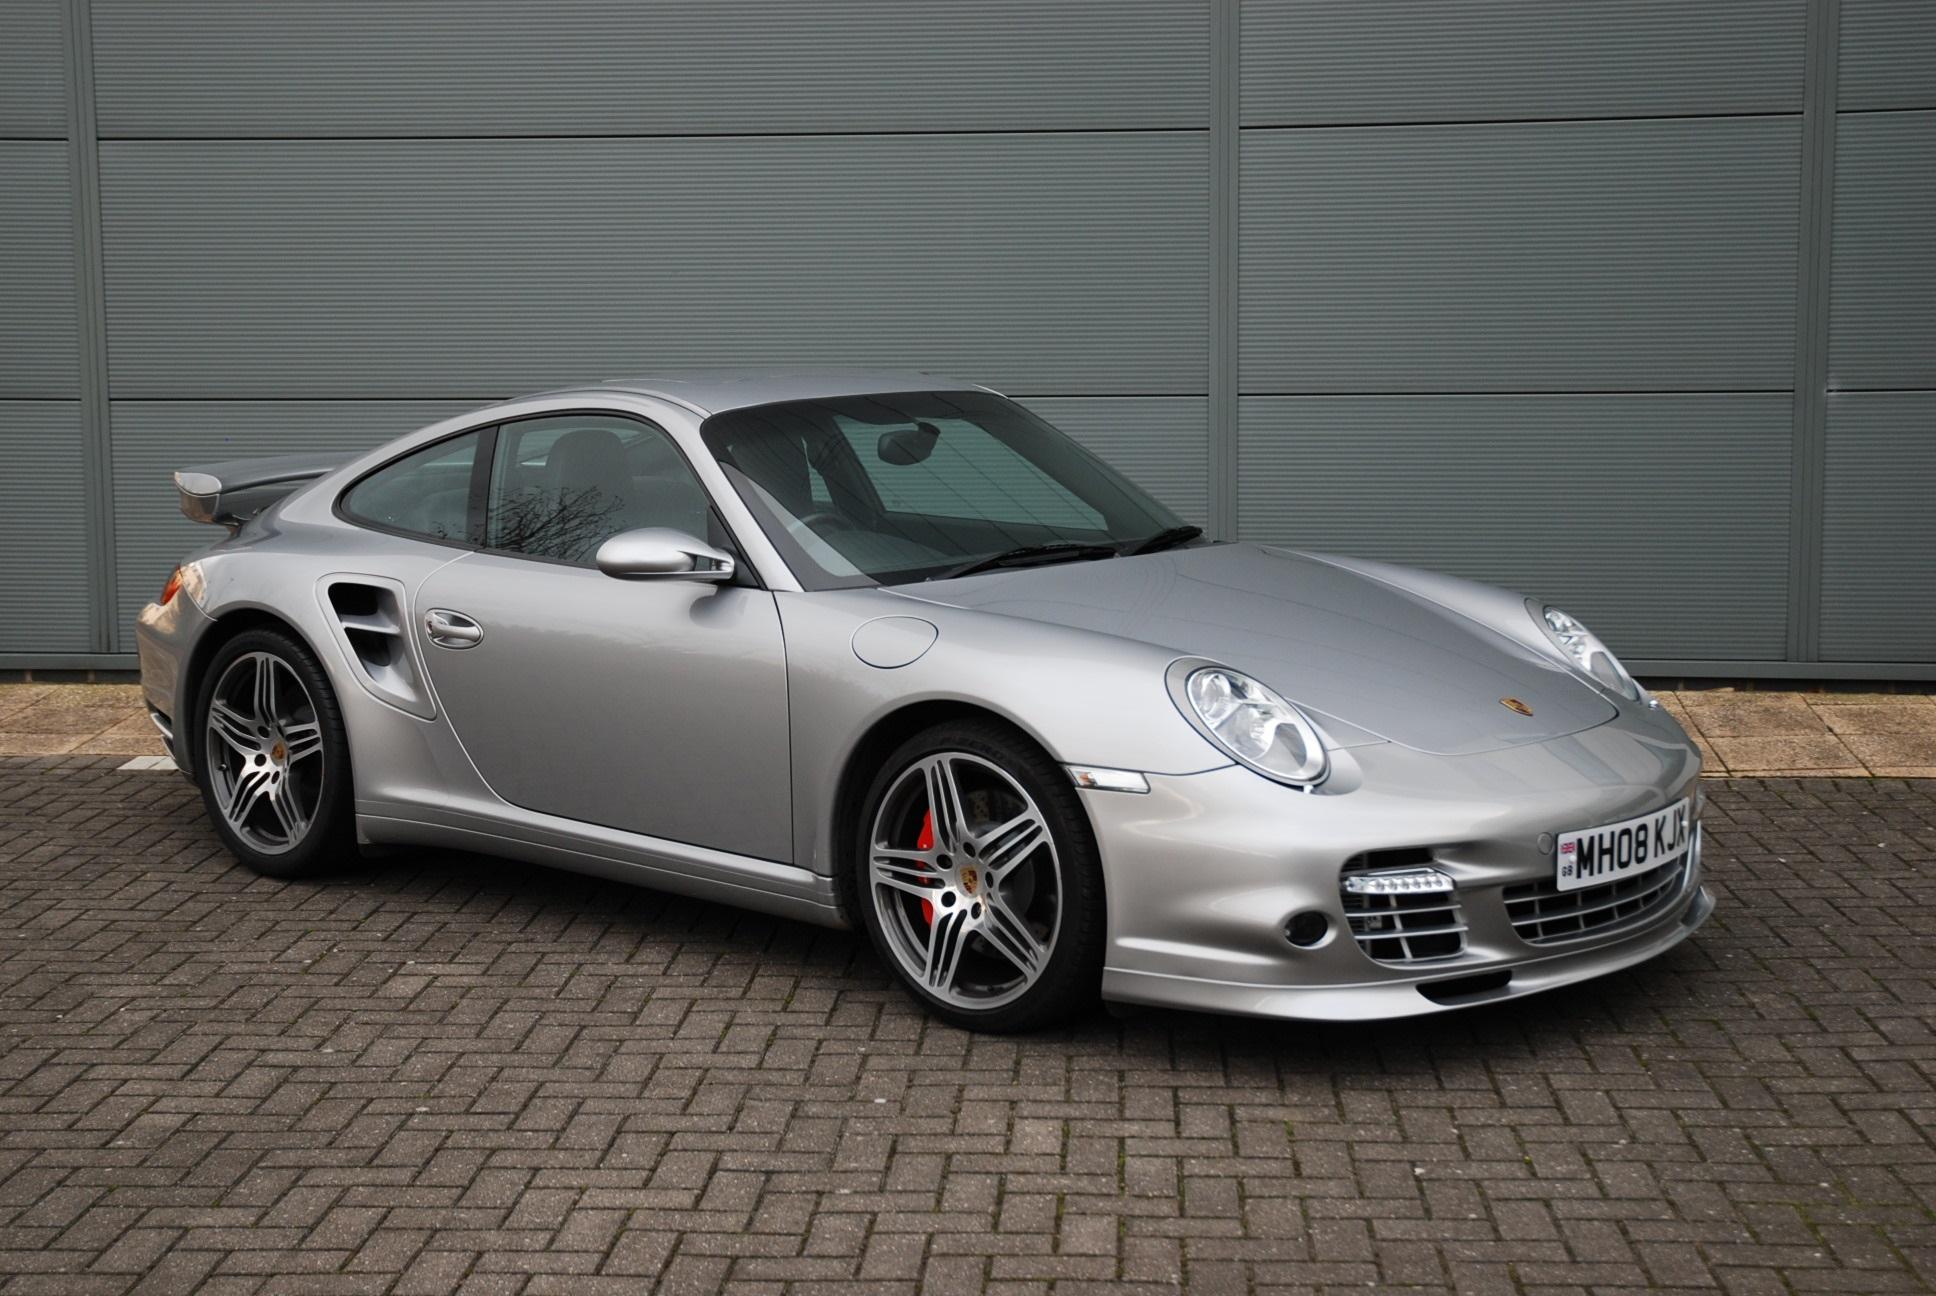 Porsche 911 997 Turbo Tiptronic Coupe For Sale Tech 9